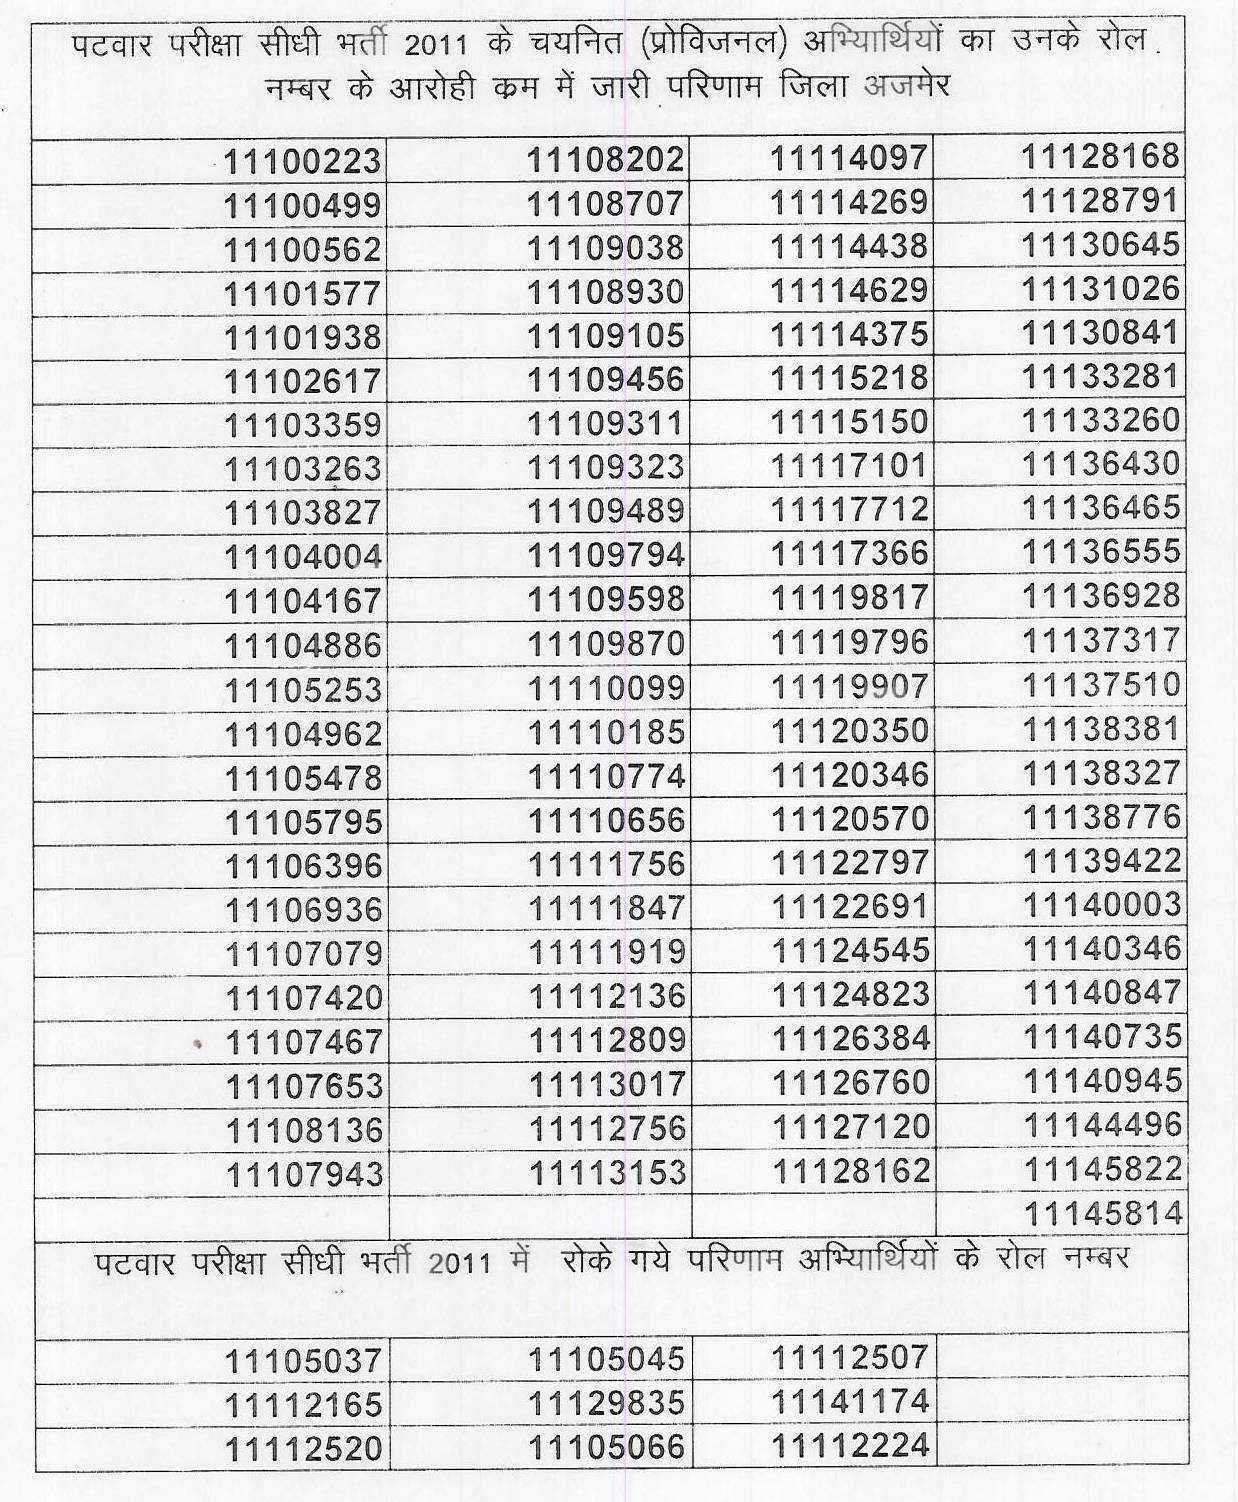 patwari exam result 2011